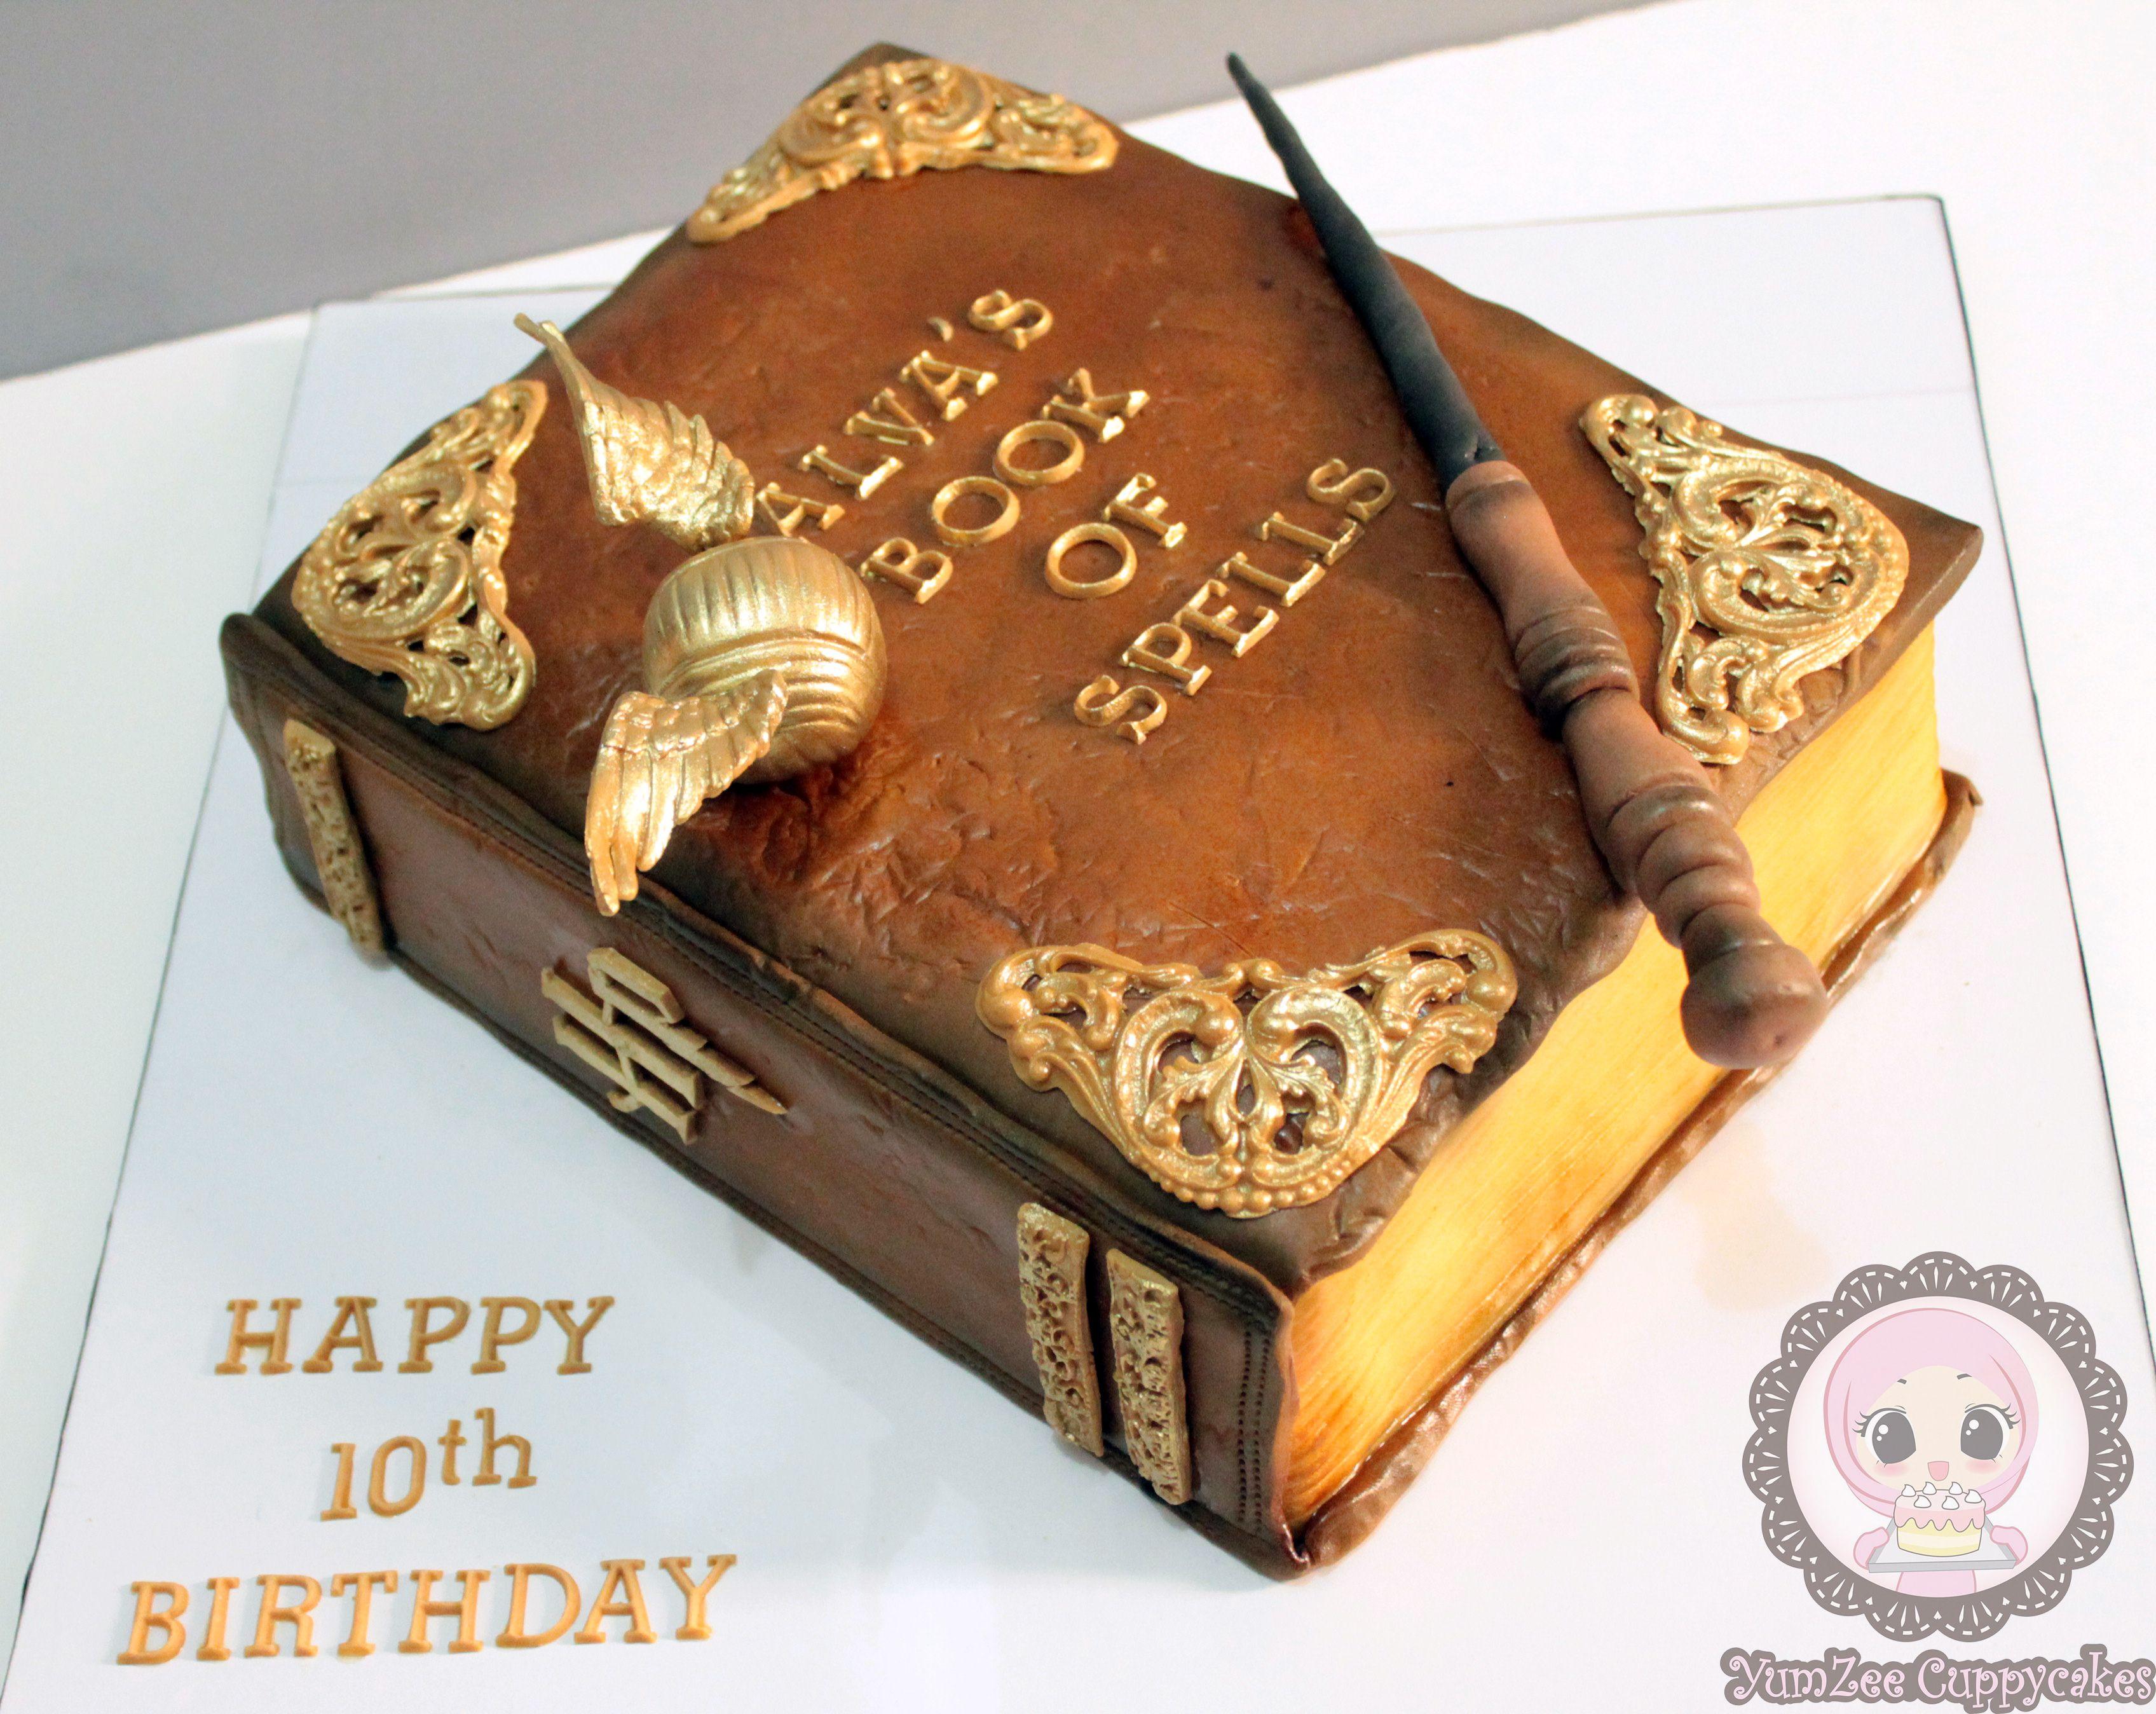 Harry Potter Book Of Spells Cake Harry Potter Geburtstagskuchen Buch Kuchen Harry Potter Torte Rezept